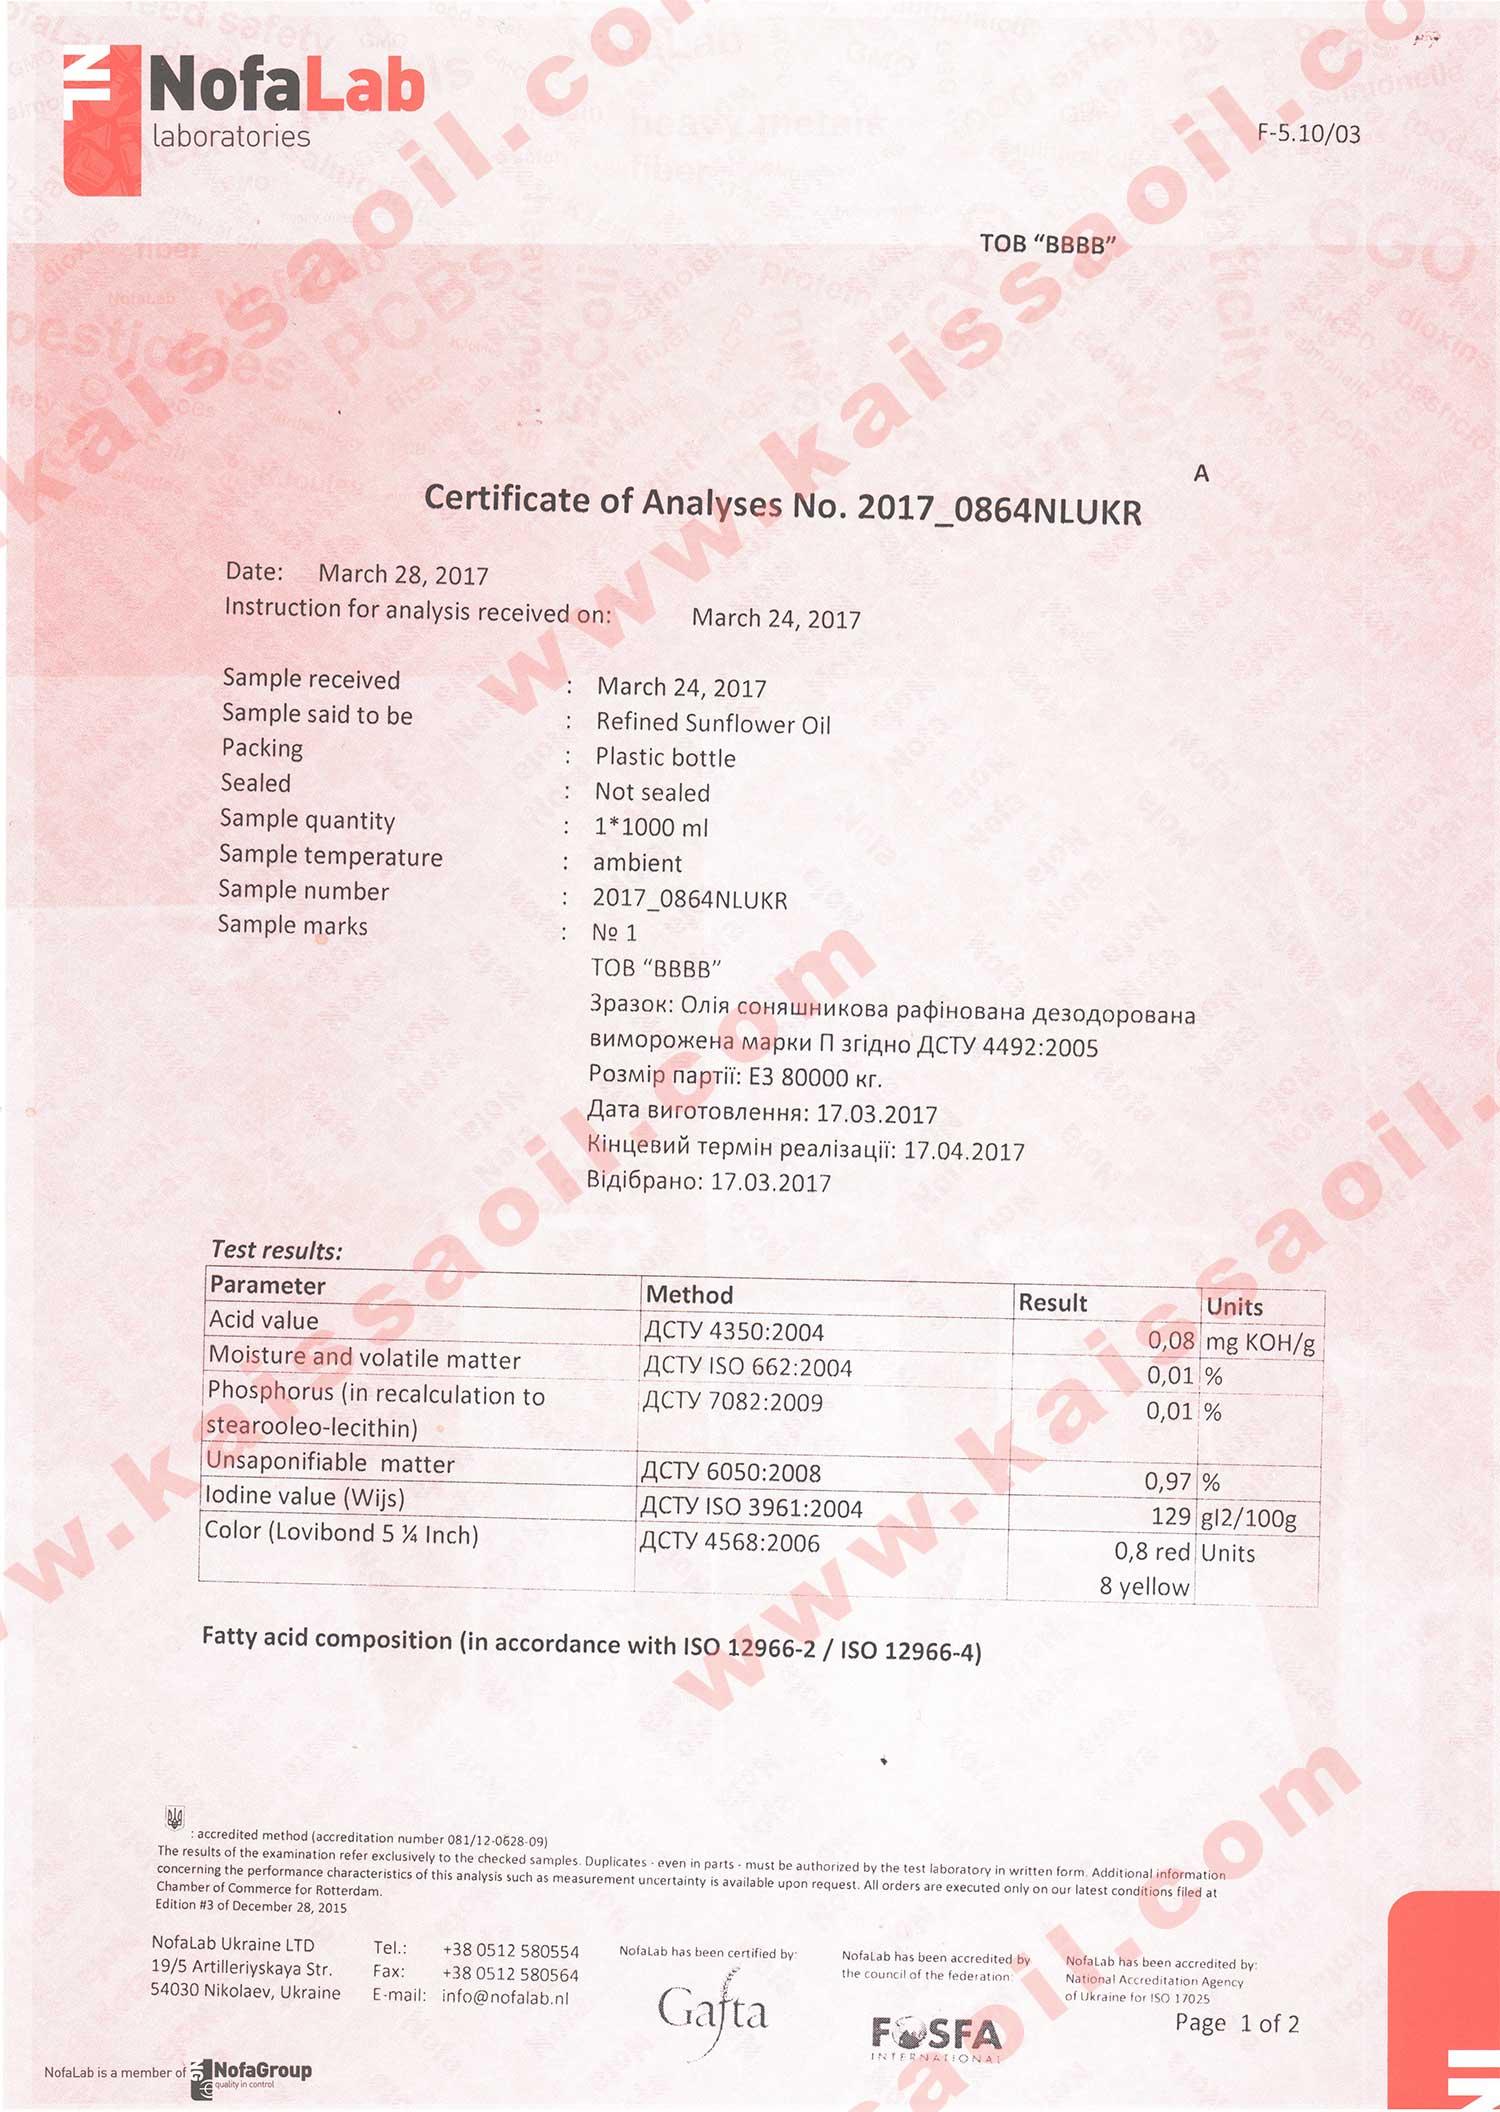 Сертификат анализа NO2017